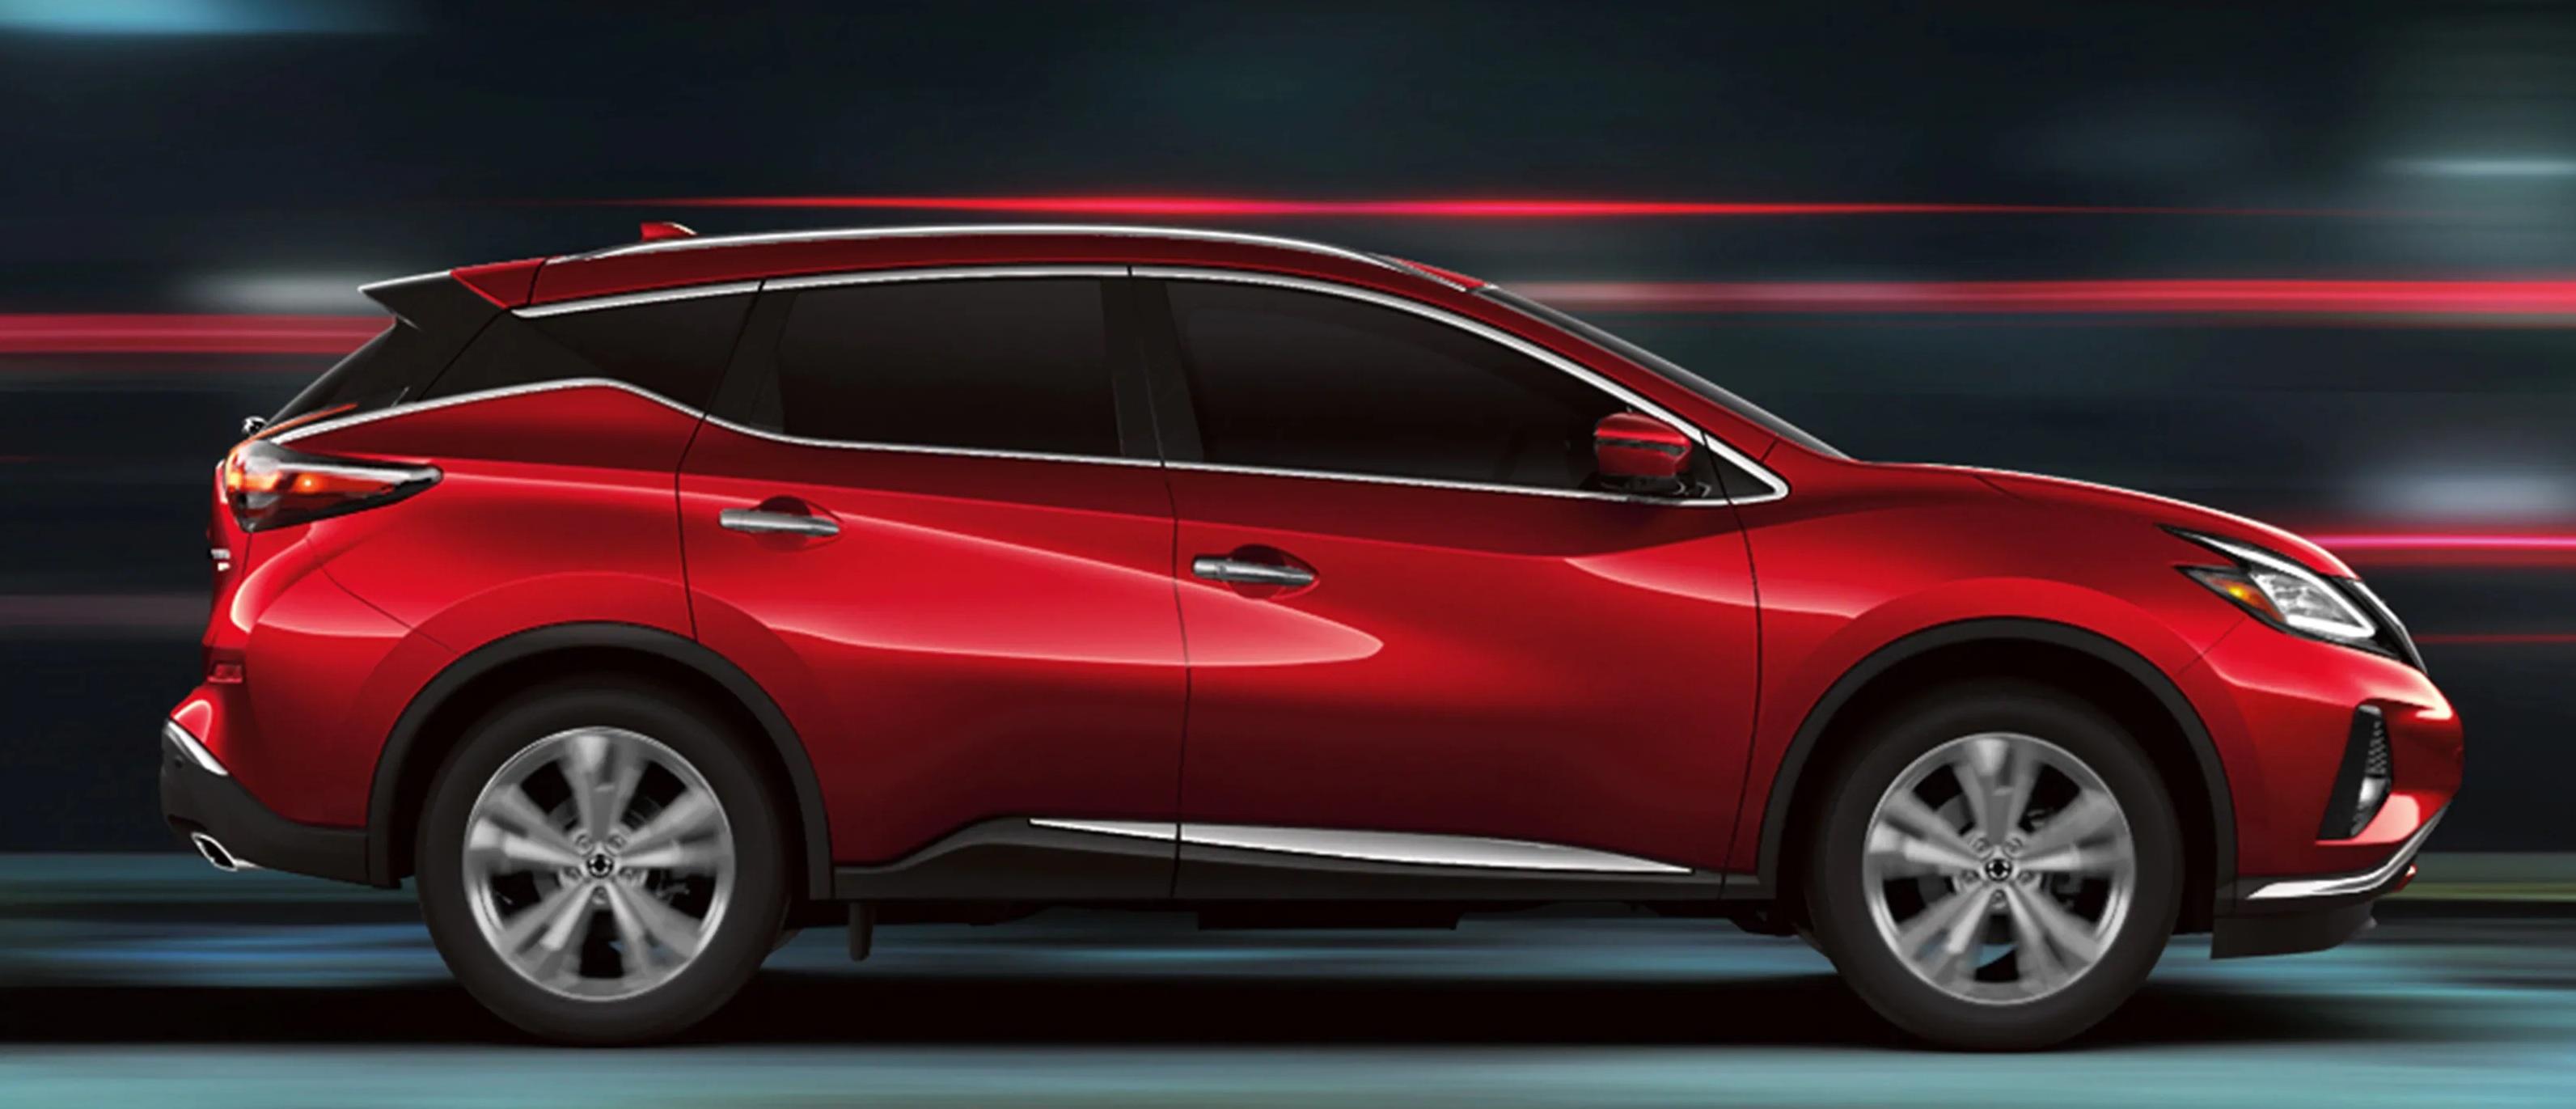 2020 Nissan Murano for Sale near Hicksville, NY